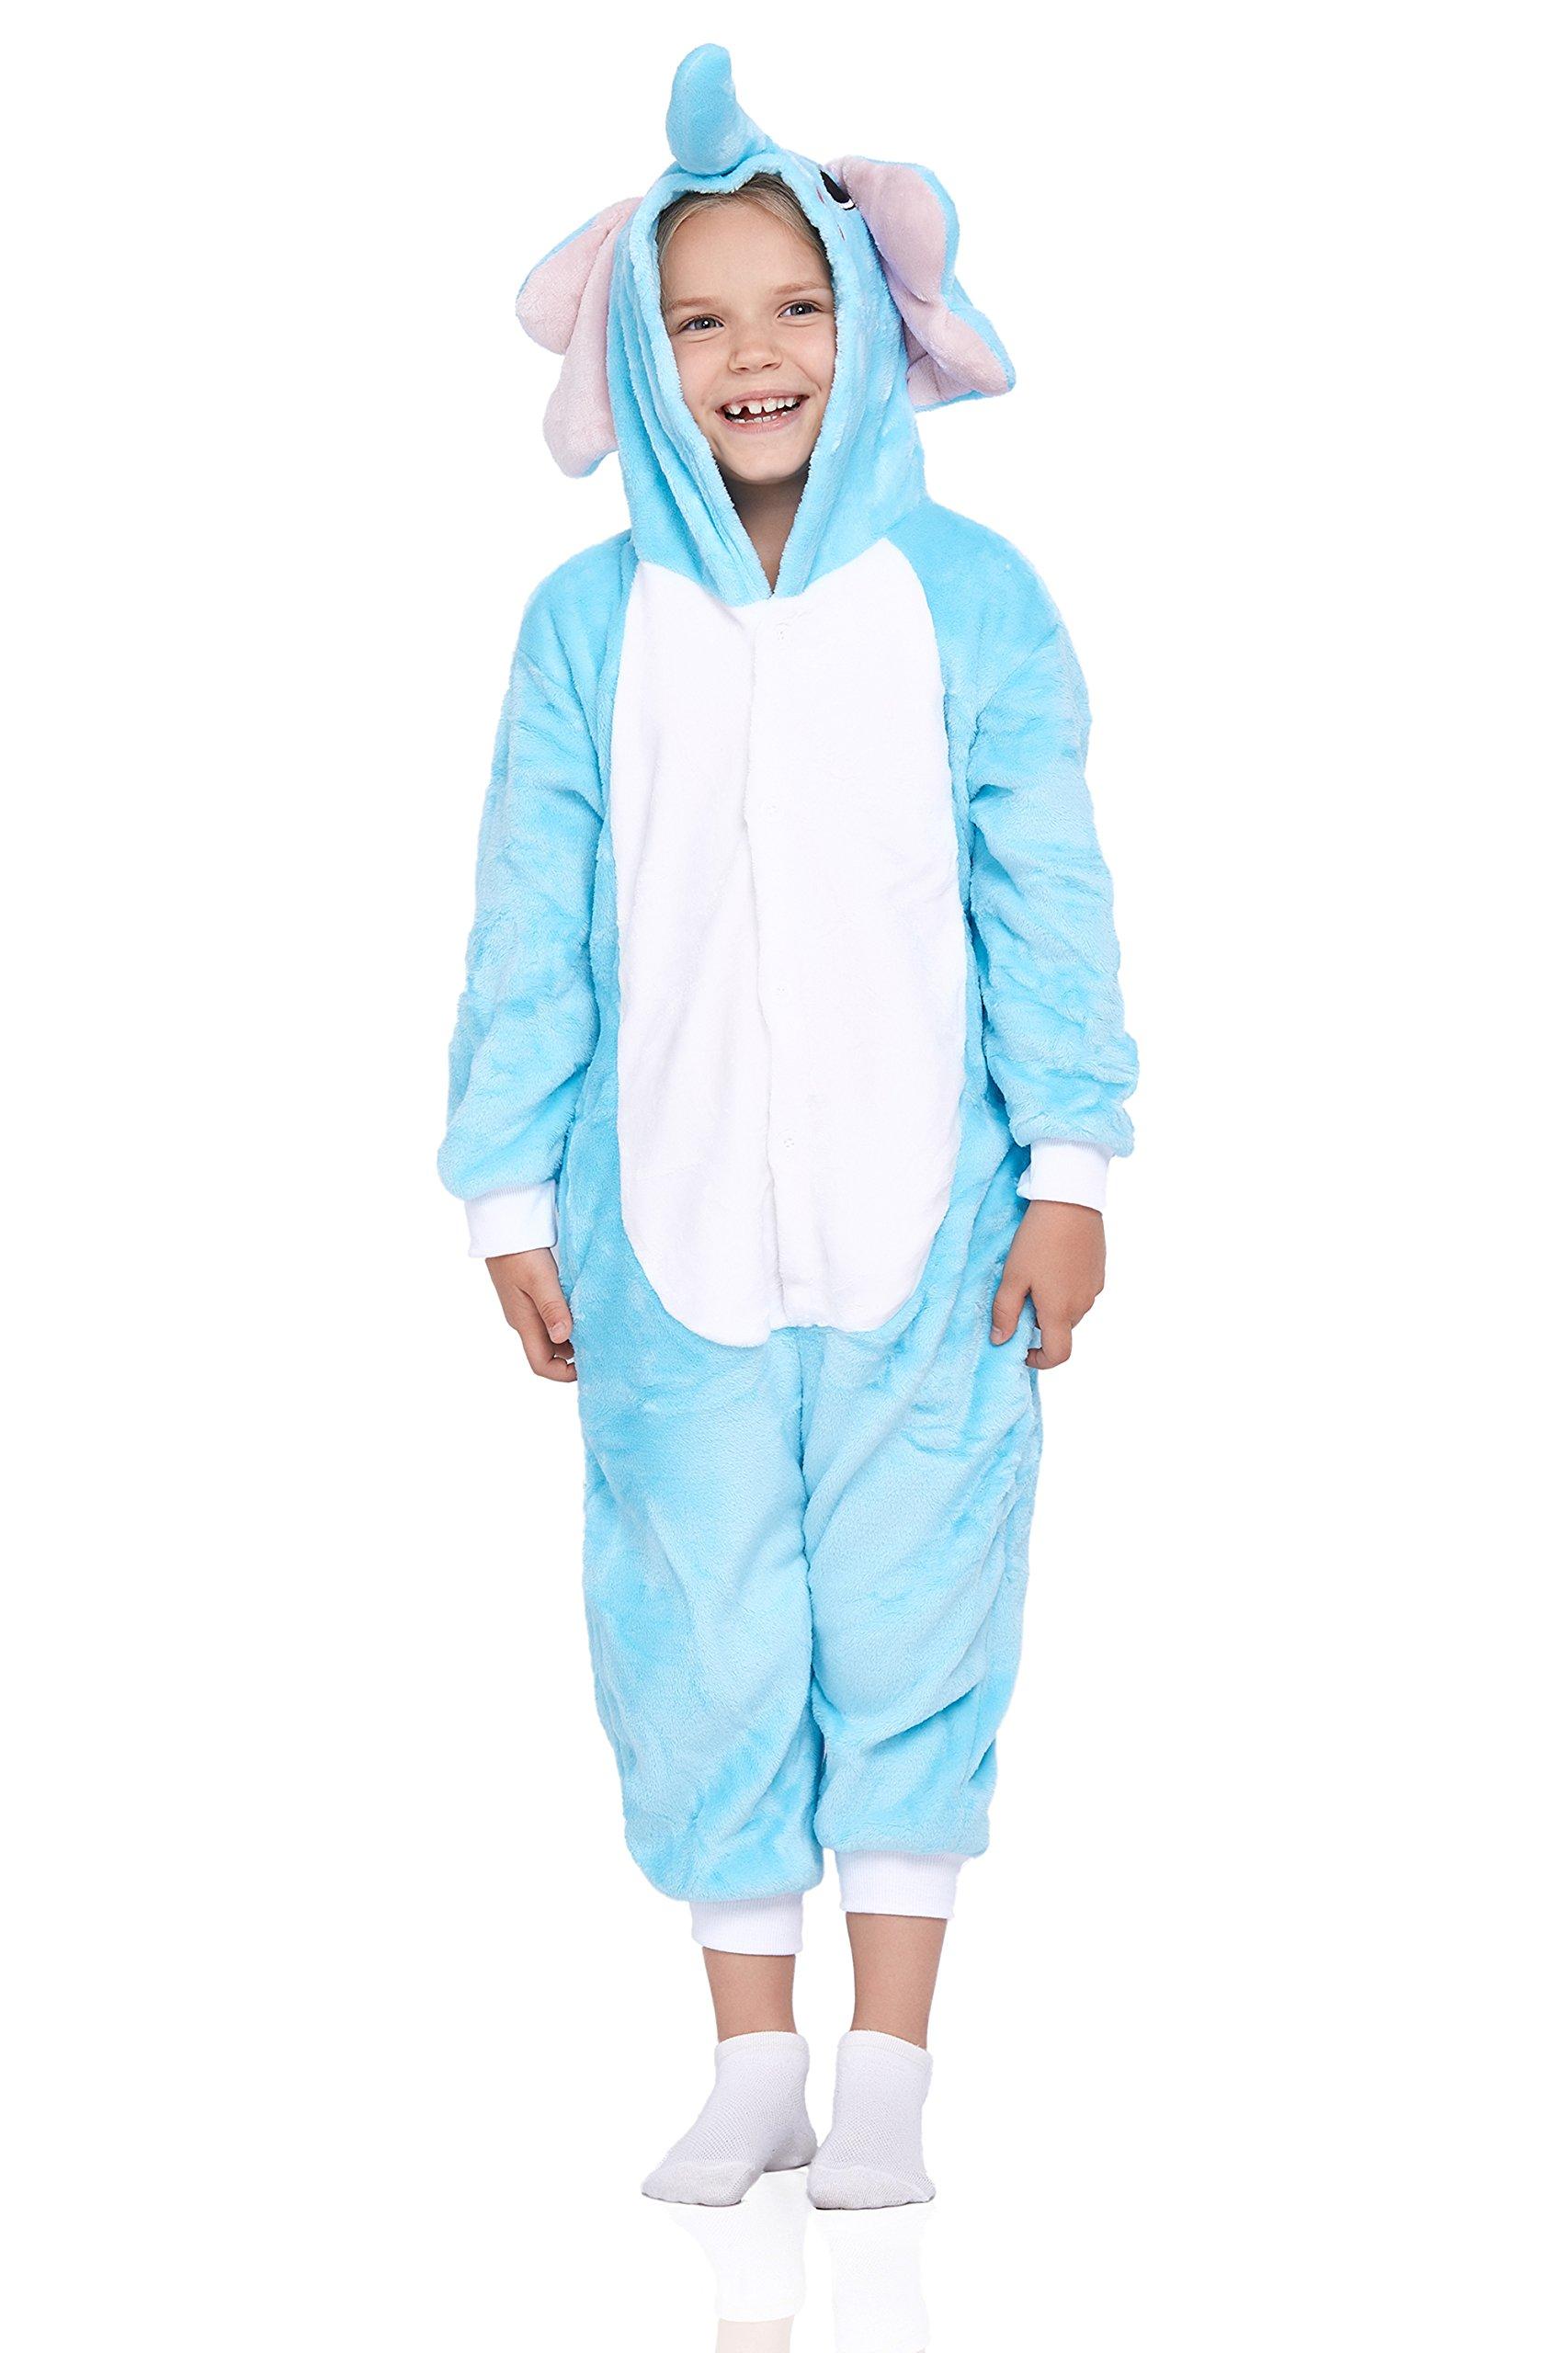 Nothing But Love Kids Elephant Pajamas Animal Onesie Kigurumi Plush Soft One Piece Cosplay Costume (Small, Light Blue)